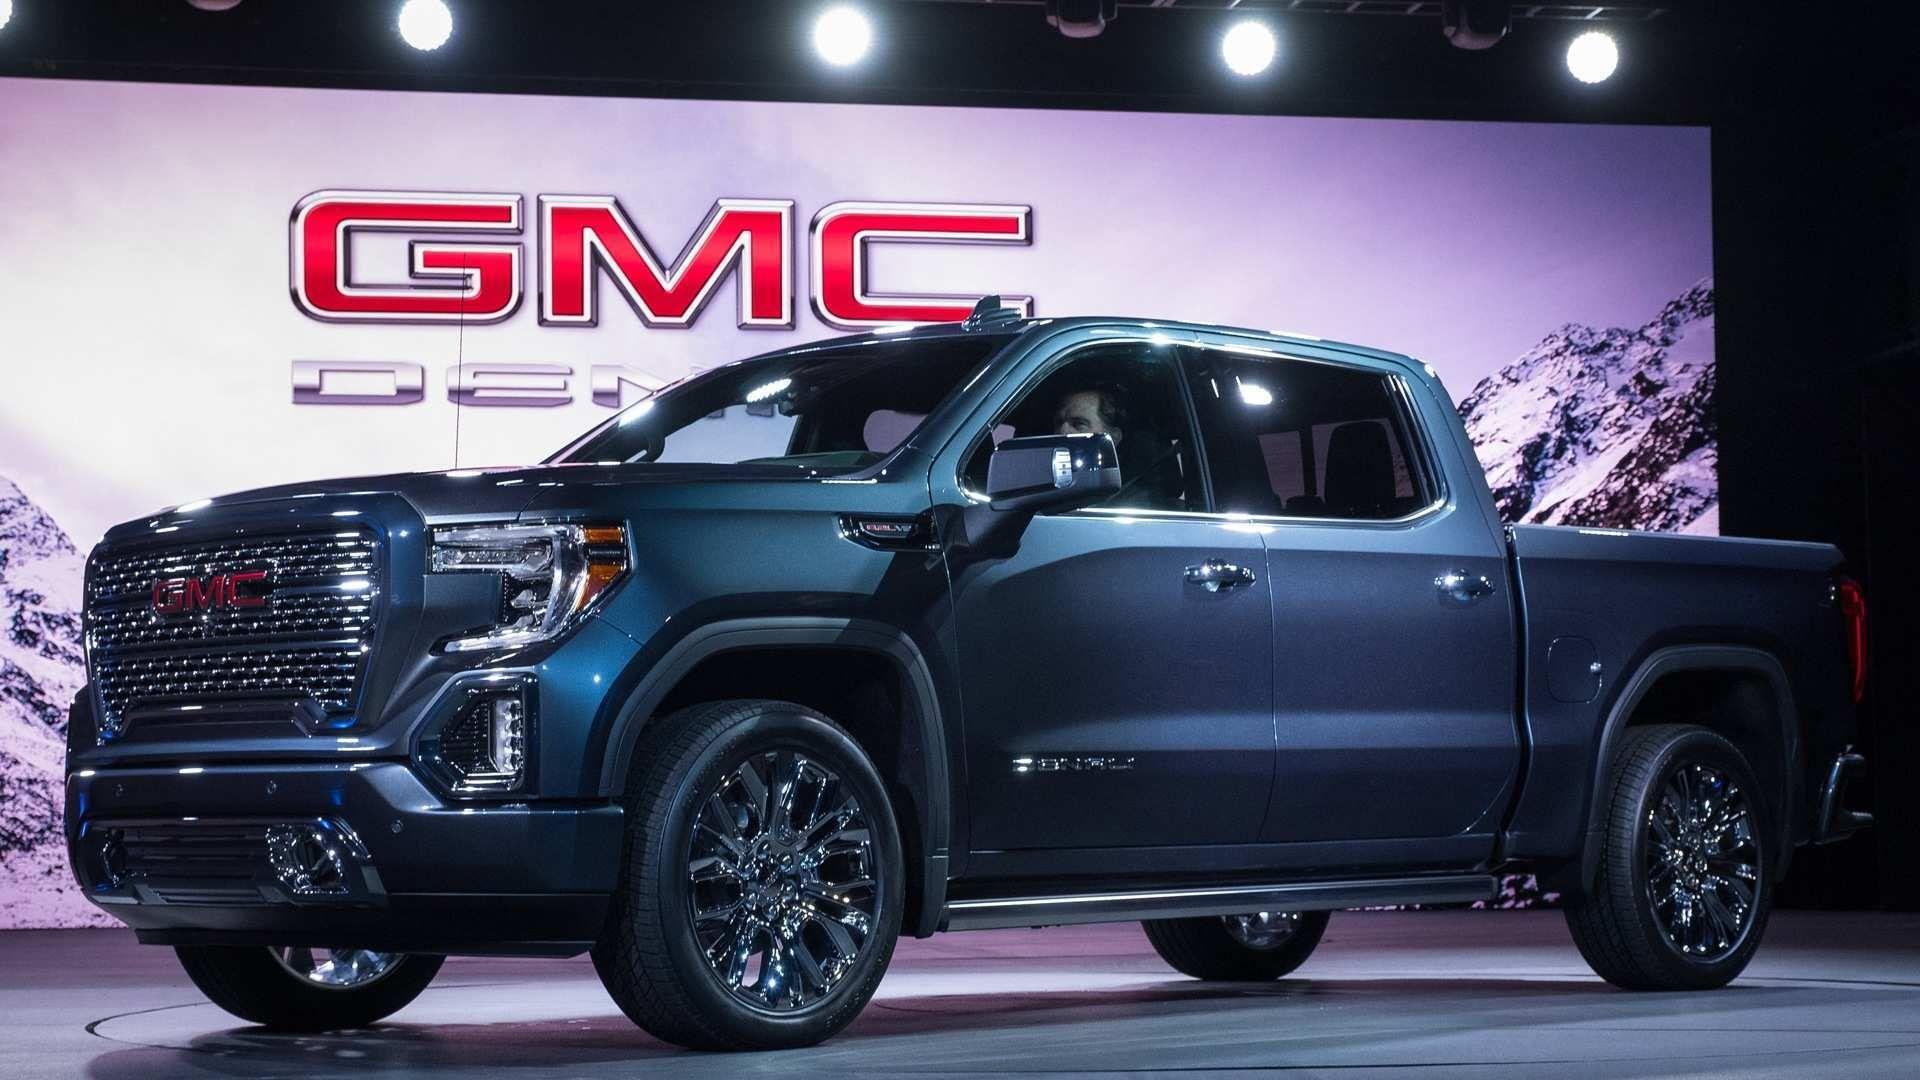 2020 Bmw Sierra Heads Up Display Concept In 2020 Gmc Trucks Gmc Sierra Denali Gmc Denali